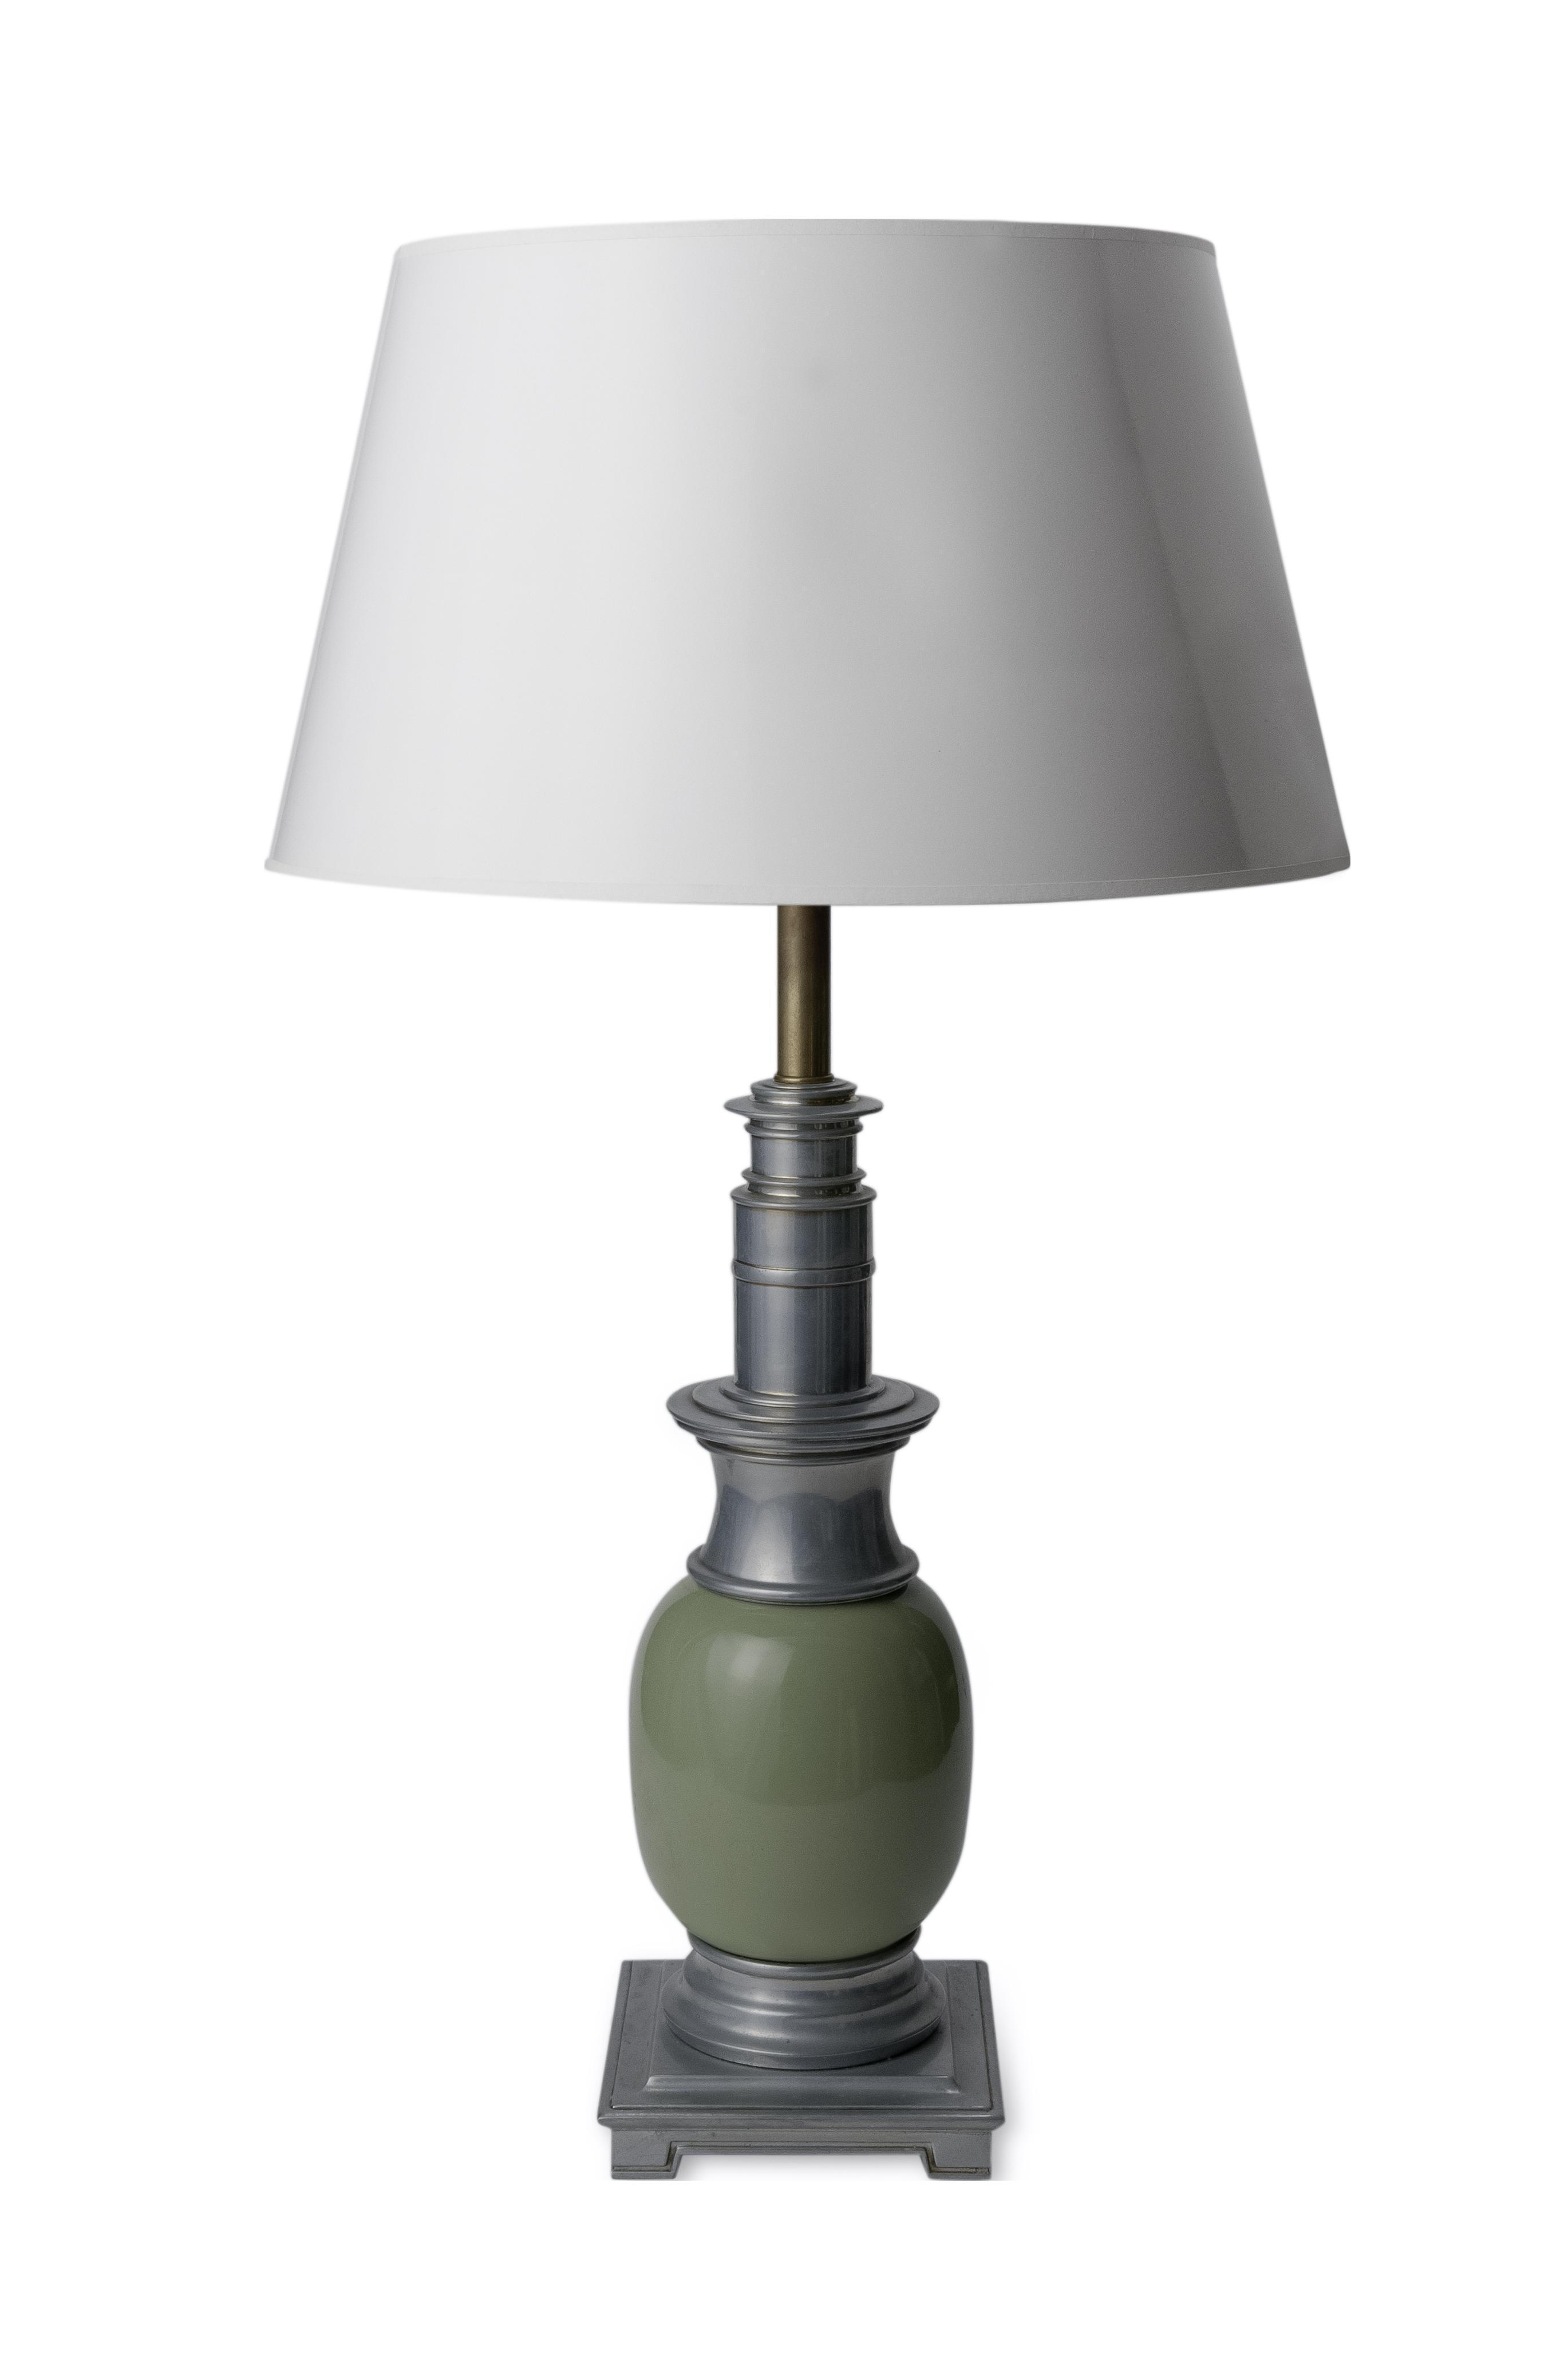 Vintage Stiffel Celadon Glazed Ostrich Egg Table Lamp